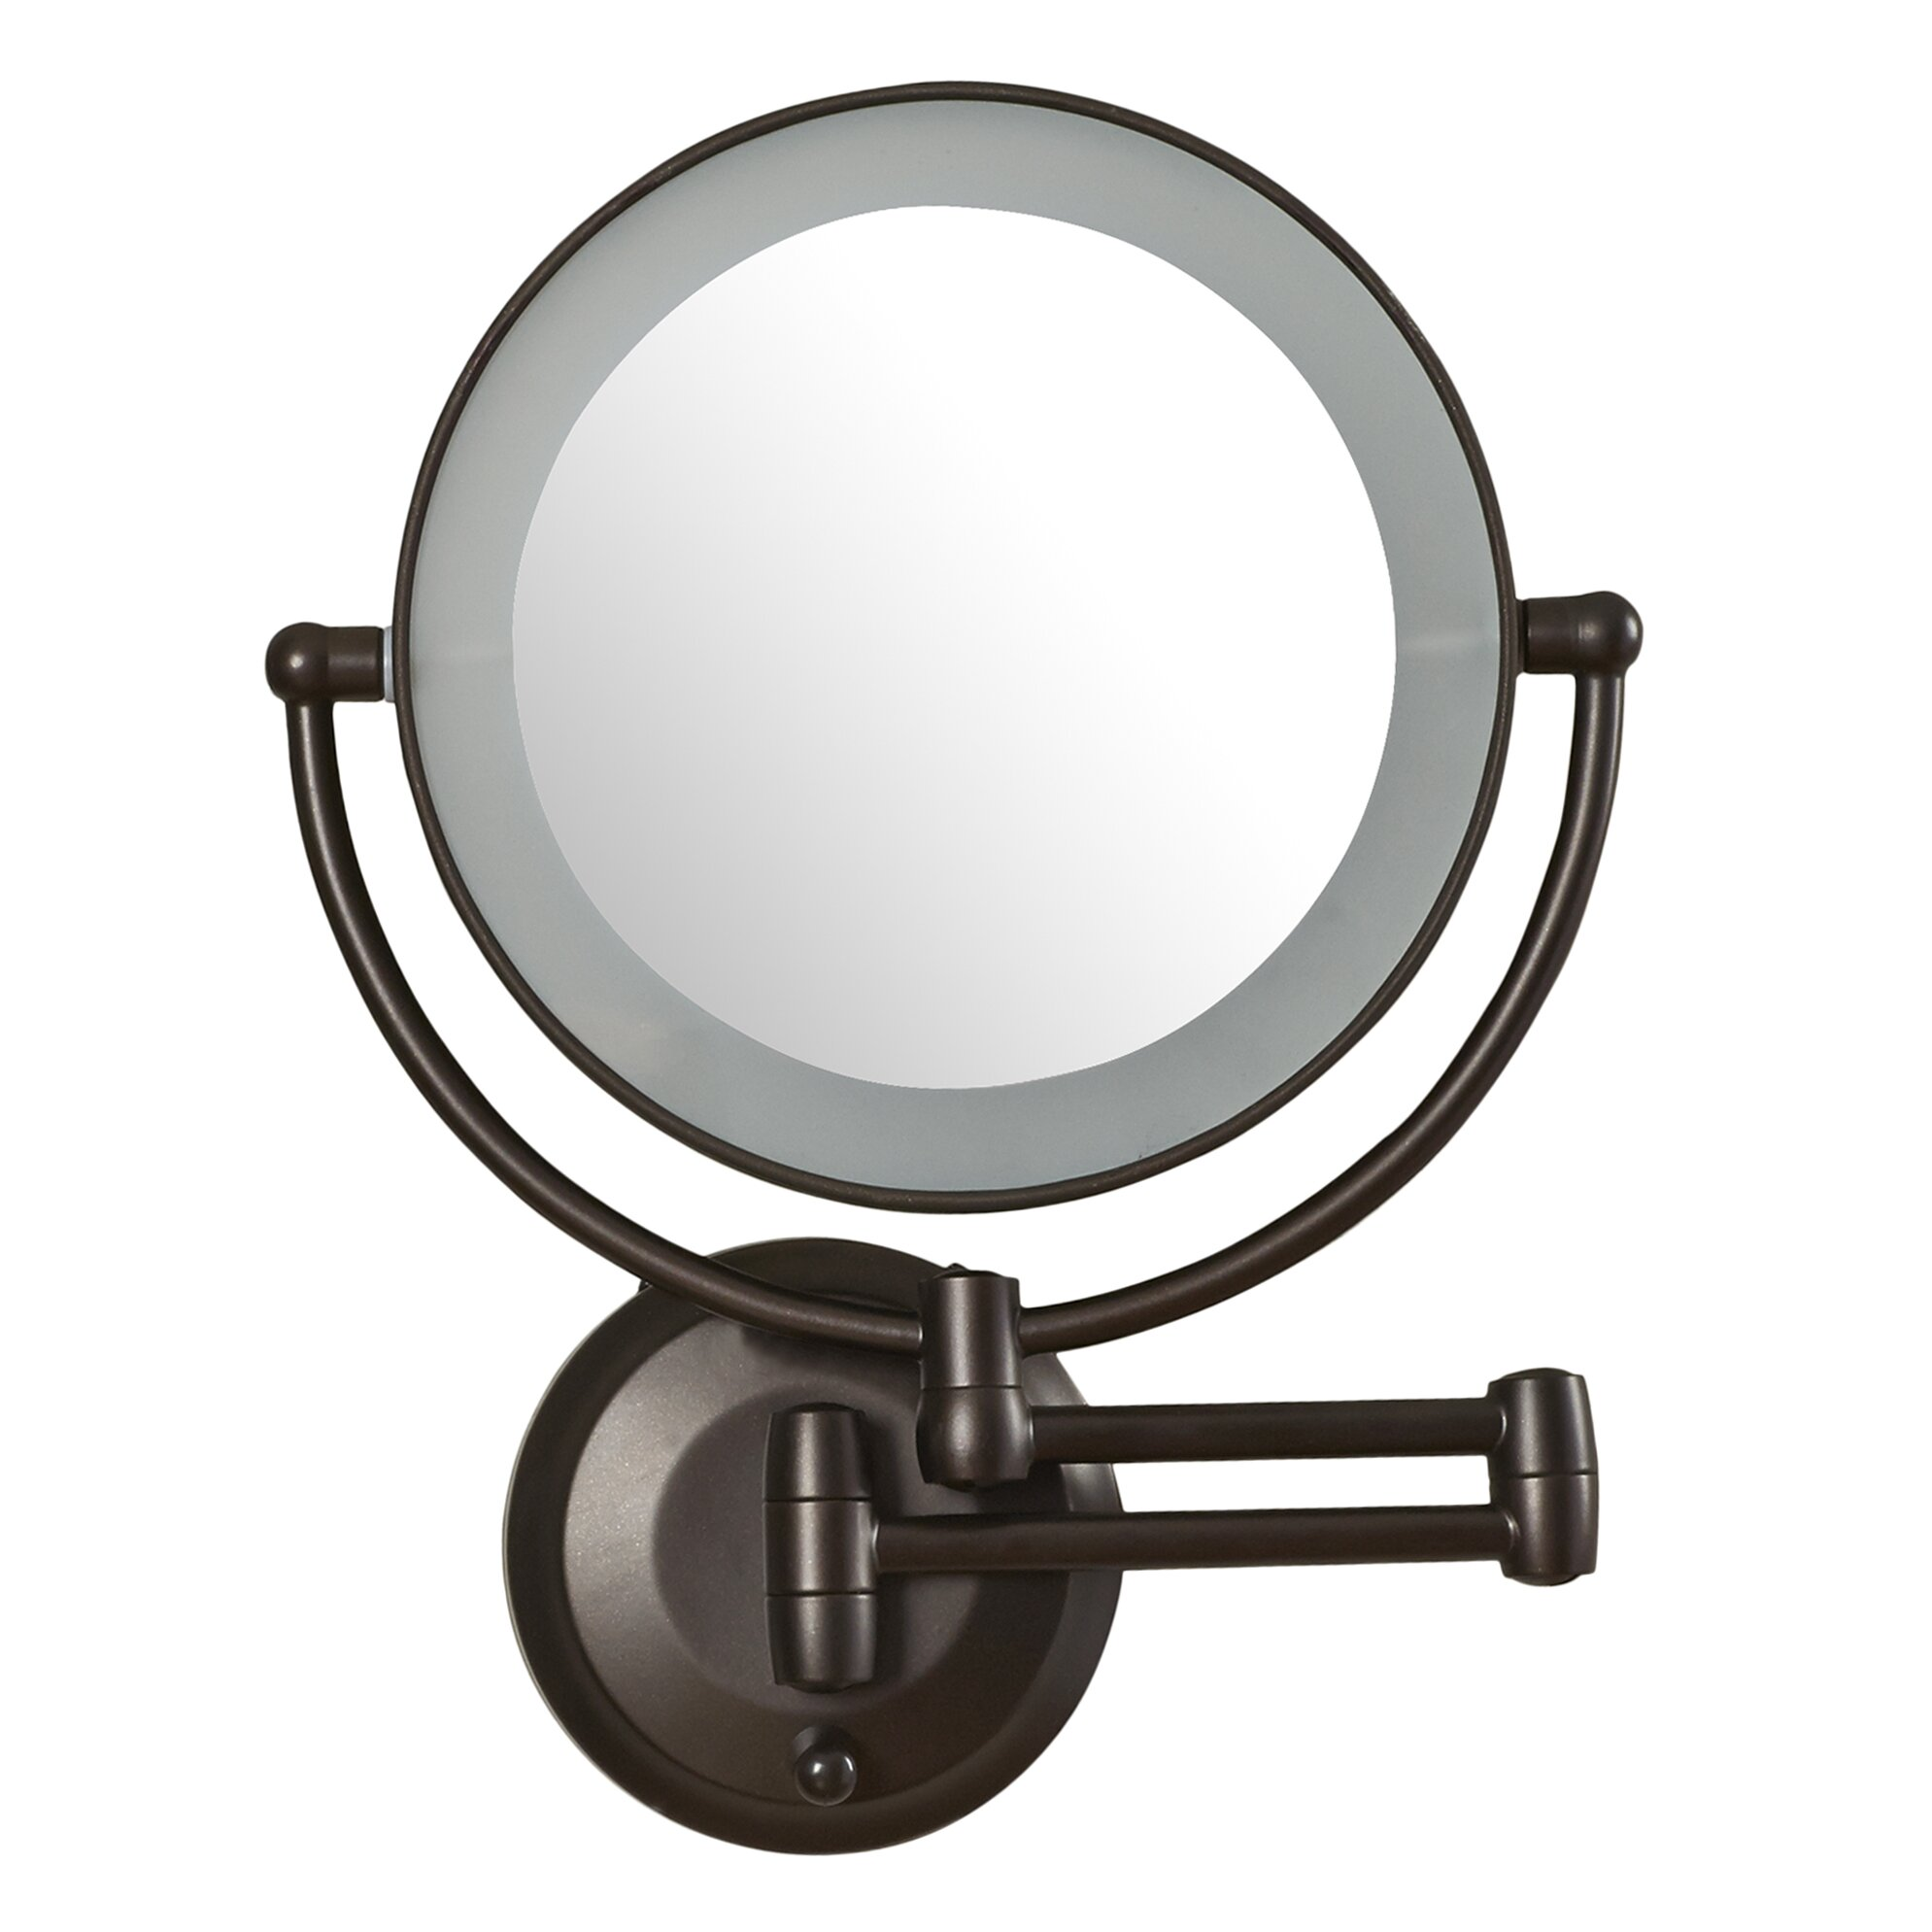 Zadro Wall Mounted Lighted Makeup Mirror: Zadro LED Lighted 1X/10X Magnification Mount Wall Mirror,Lighting